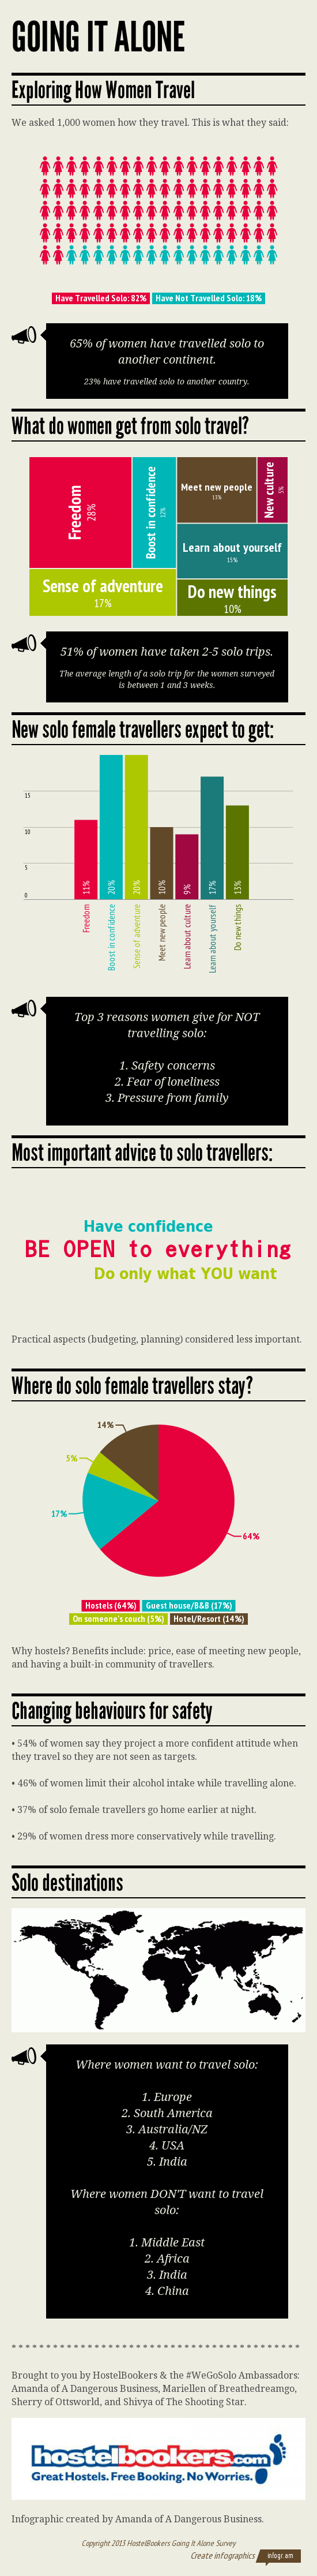 women travelling solo, women travelling alone, solo female travel